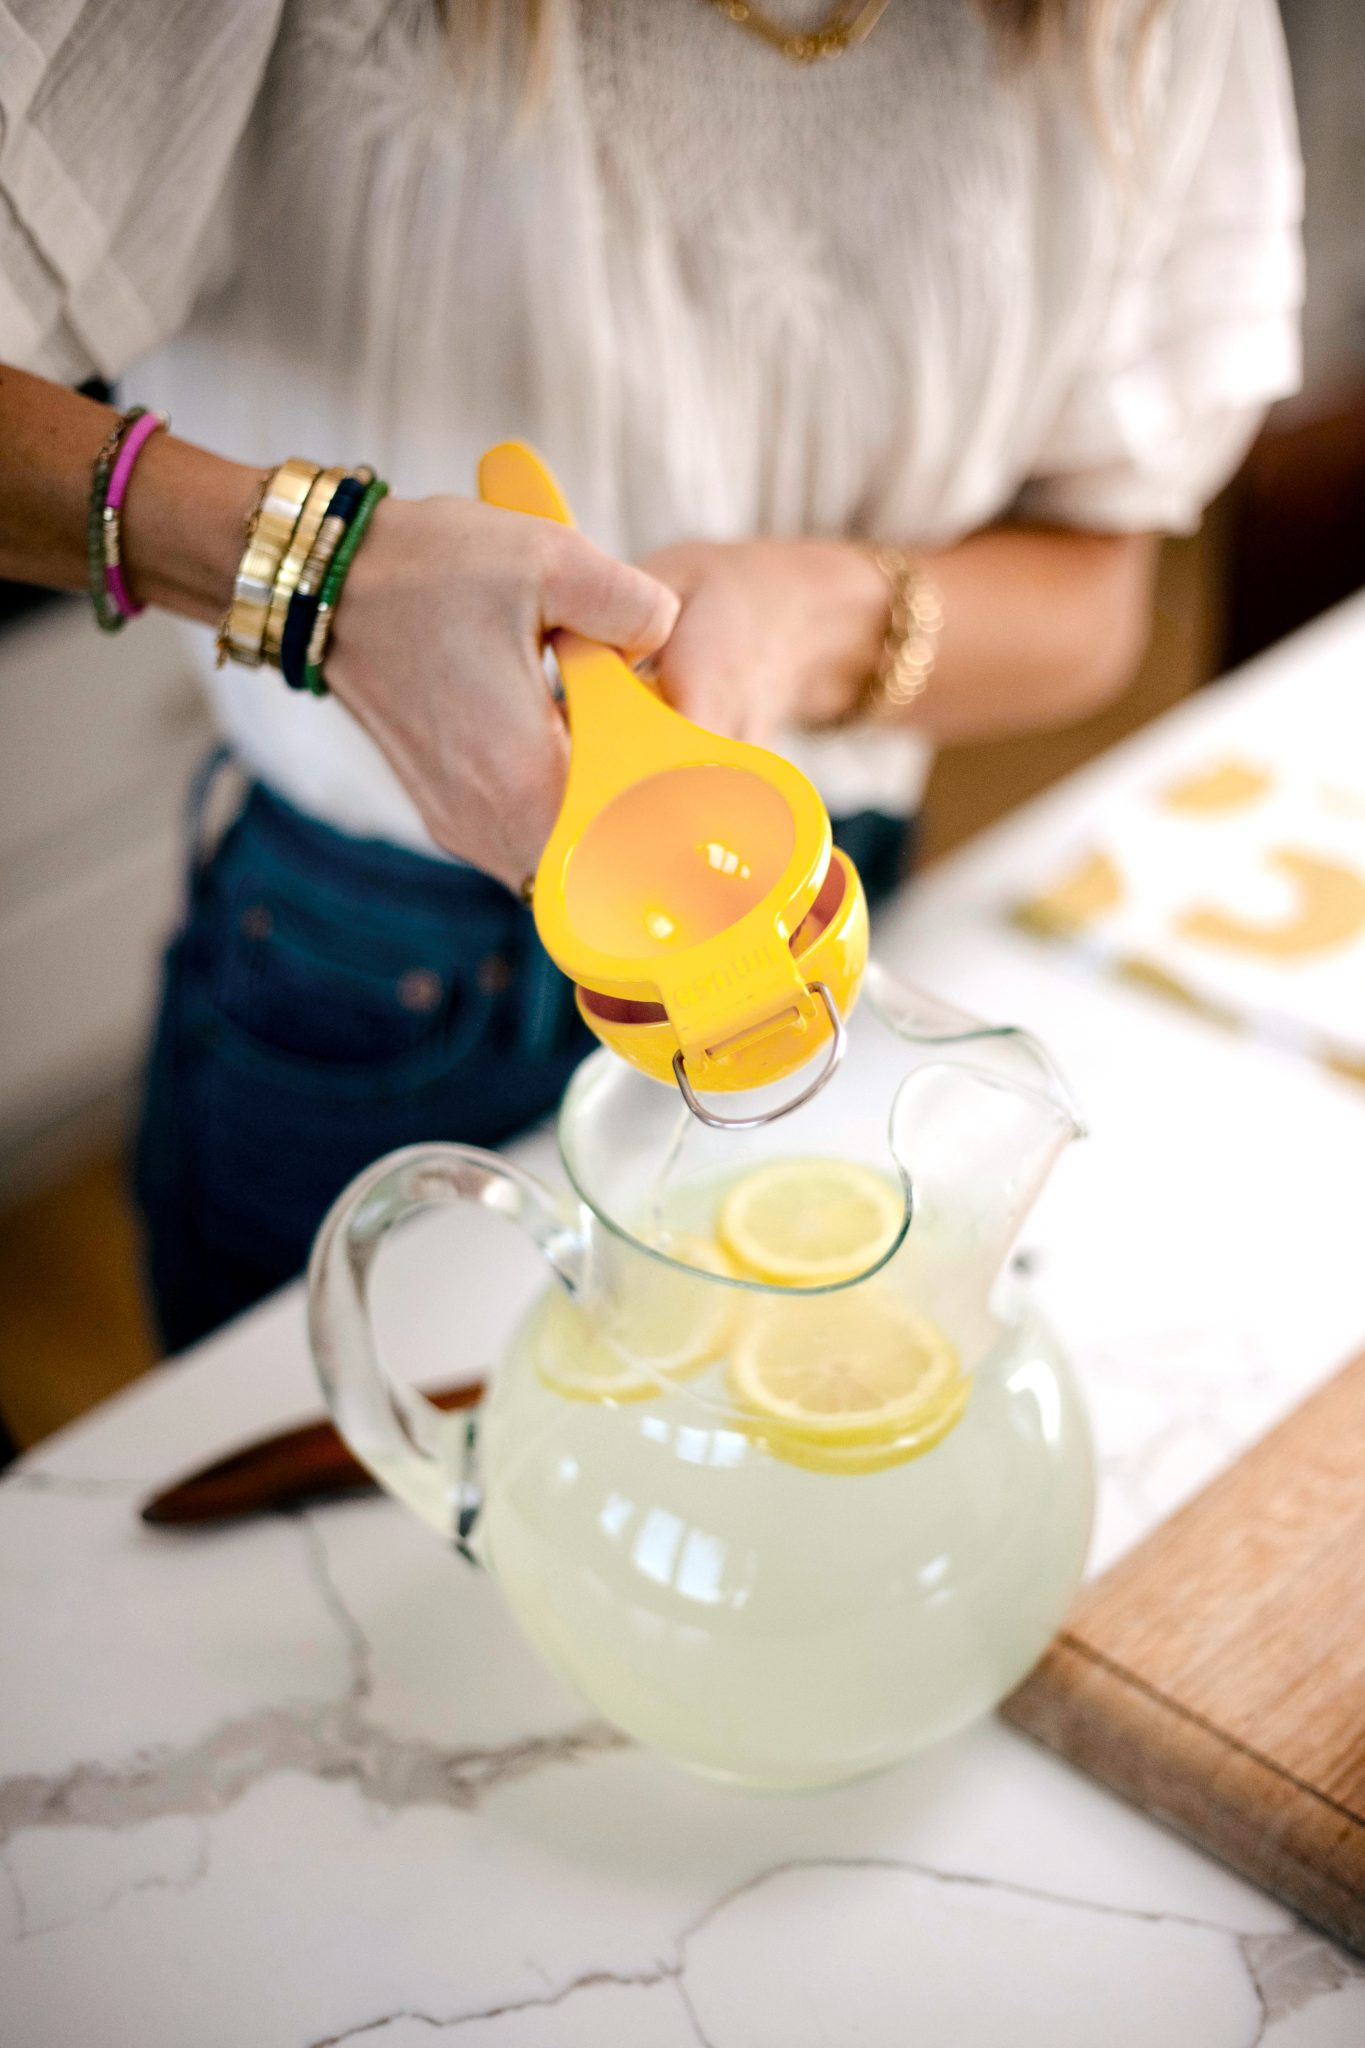 woman using lemon squeezer